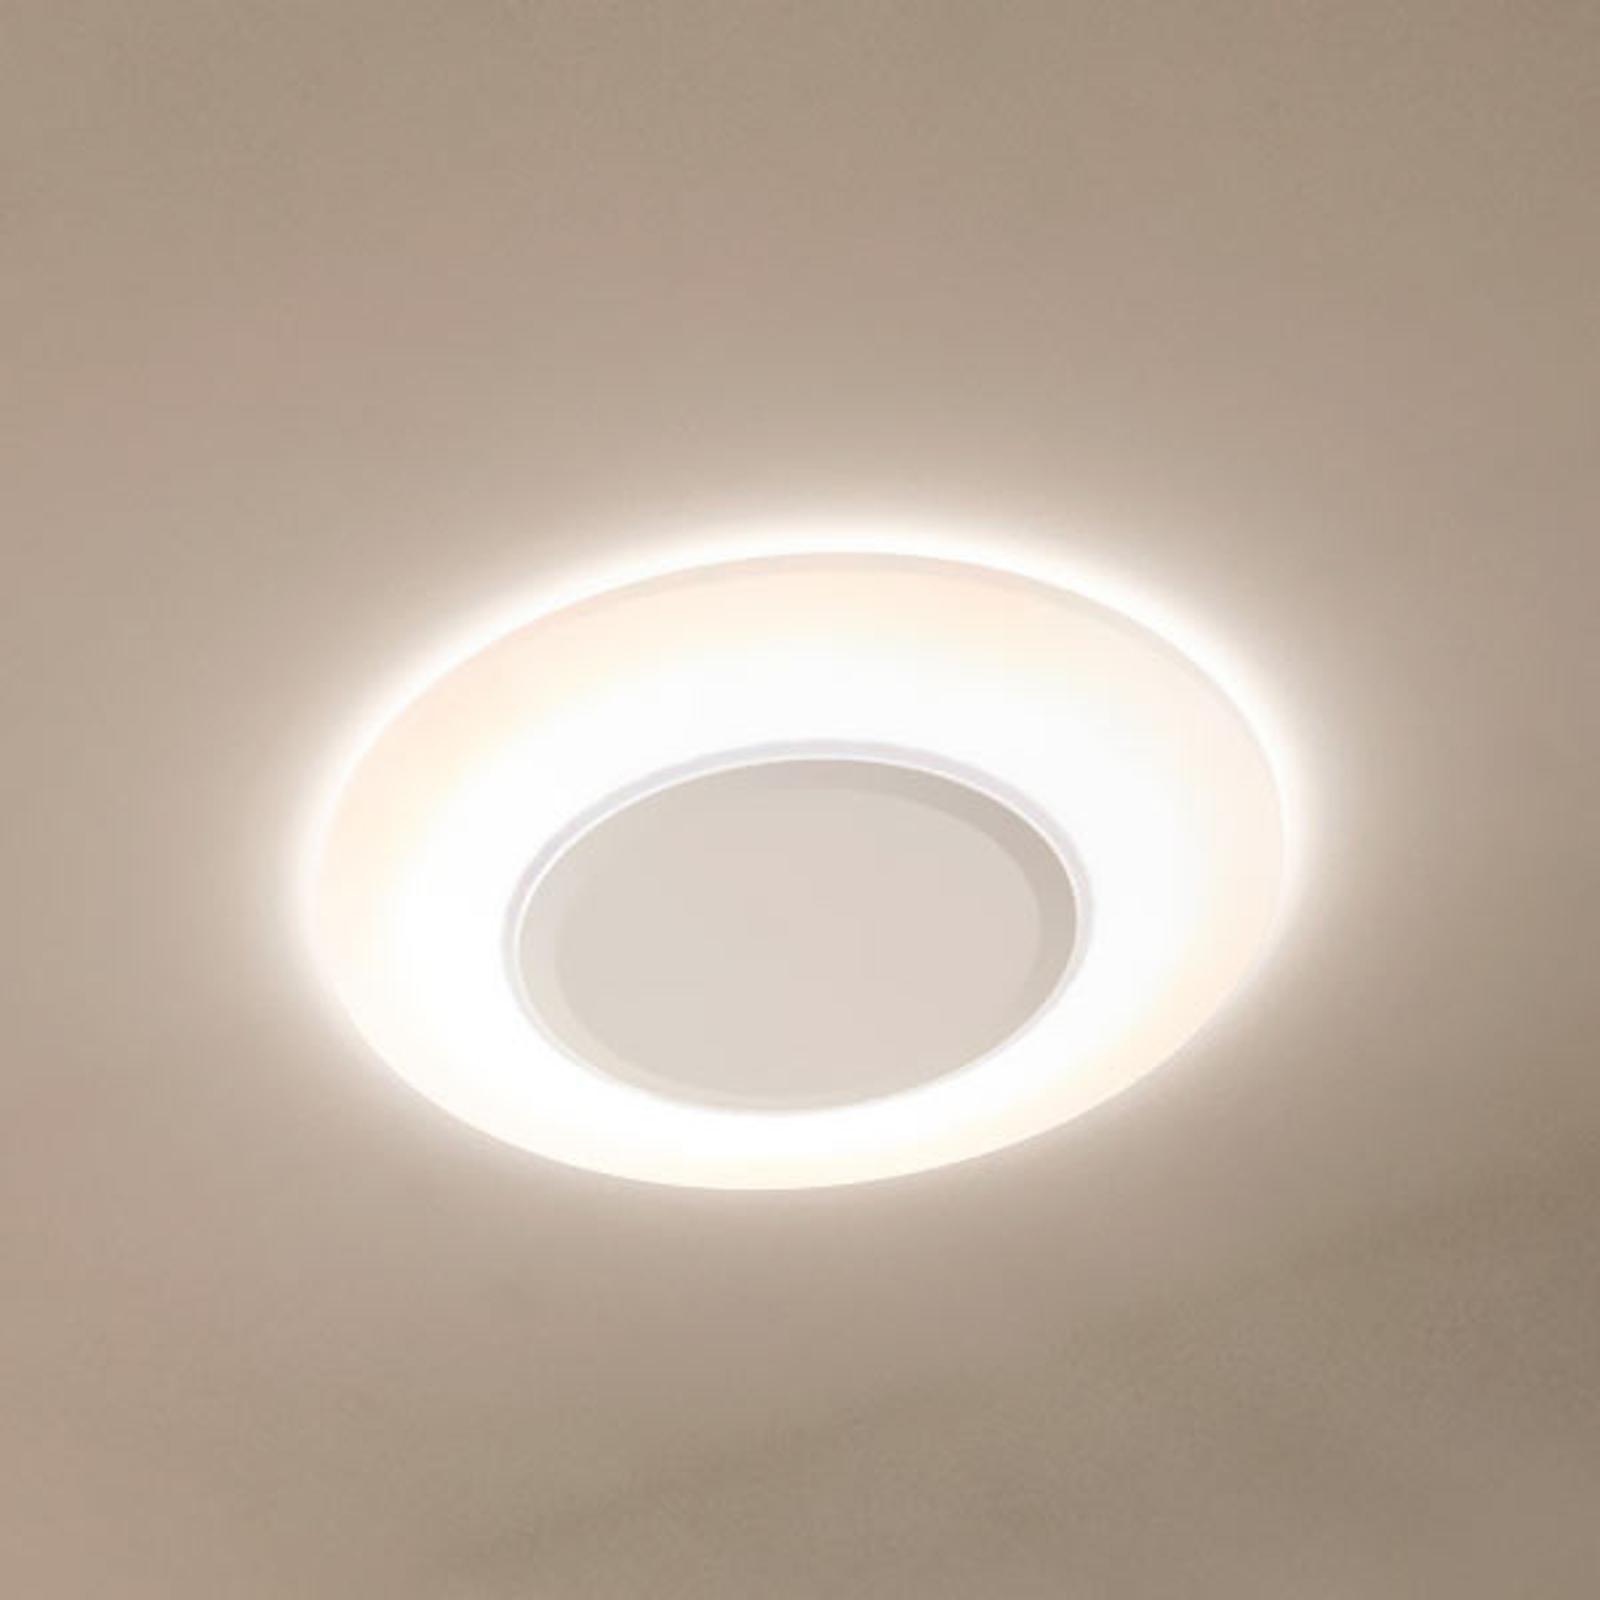 LEDVANCE Ring LED-kattovalaisin valkoinen 28cm